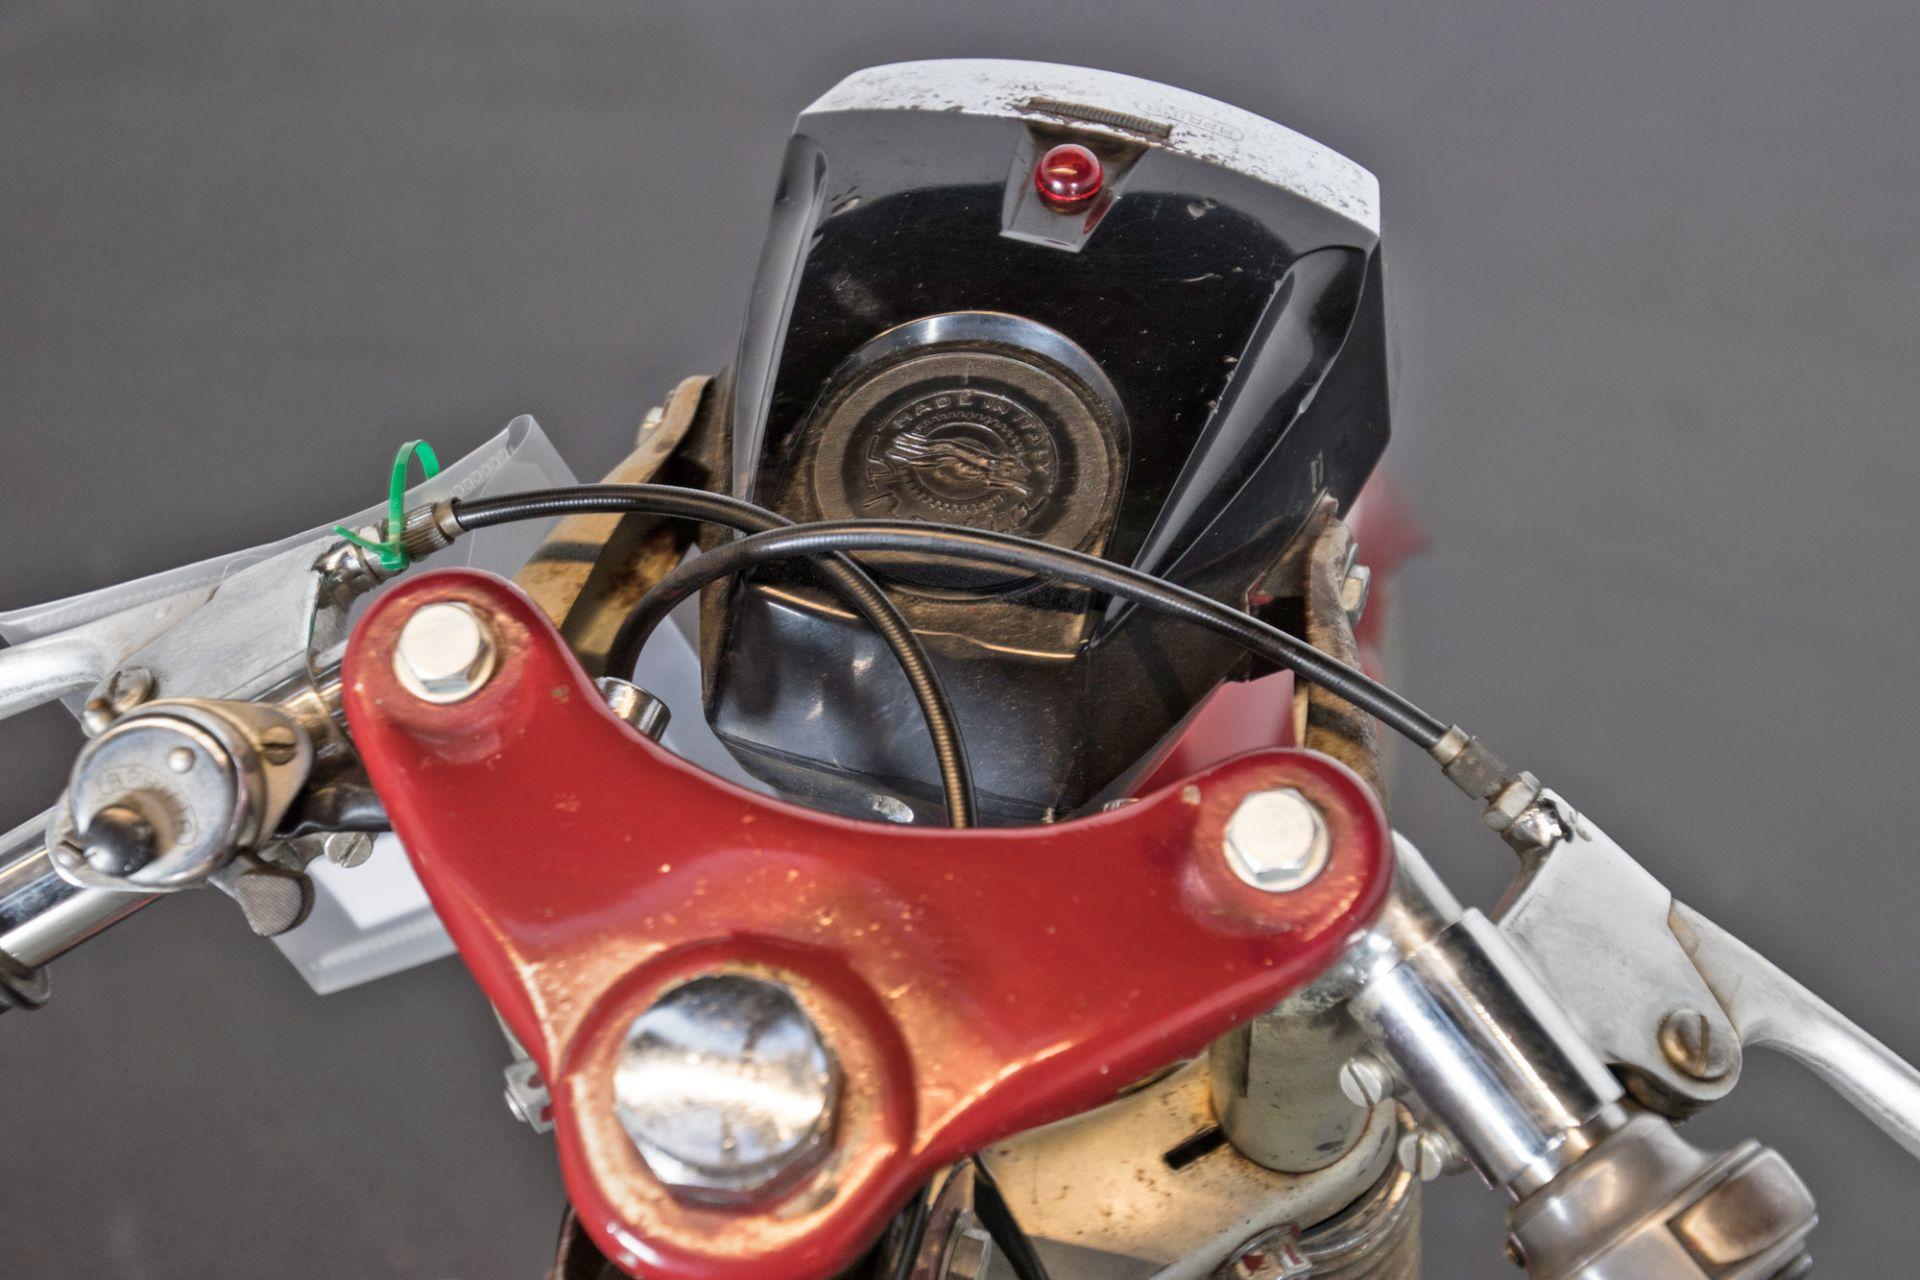 1968 Mondial FB M 4 G  34965